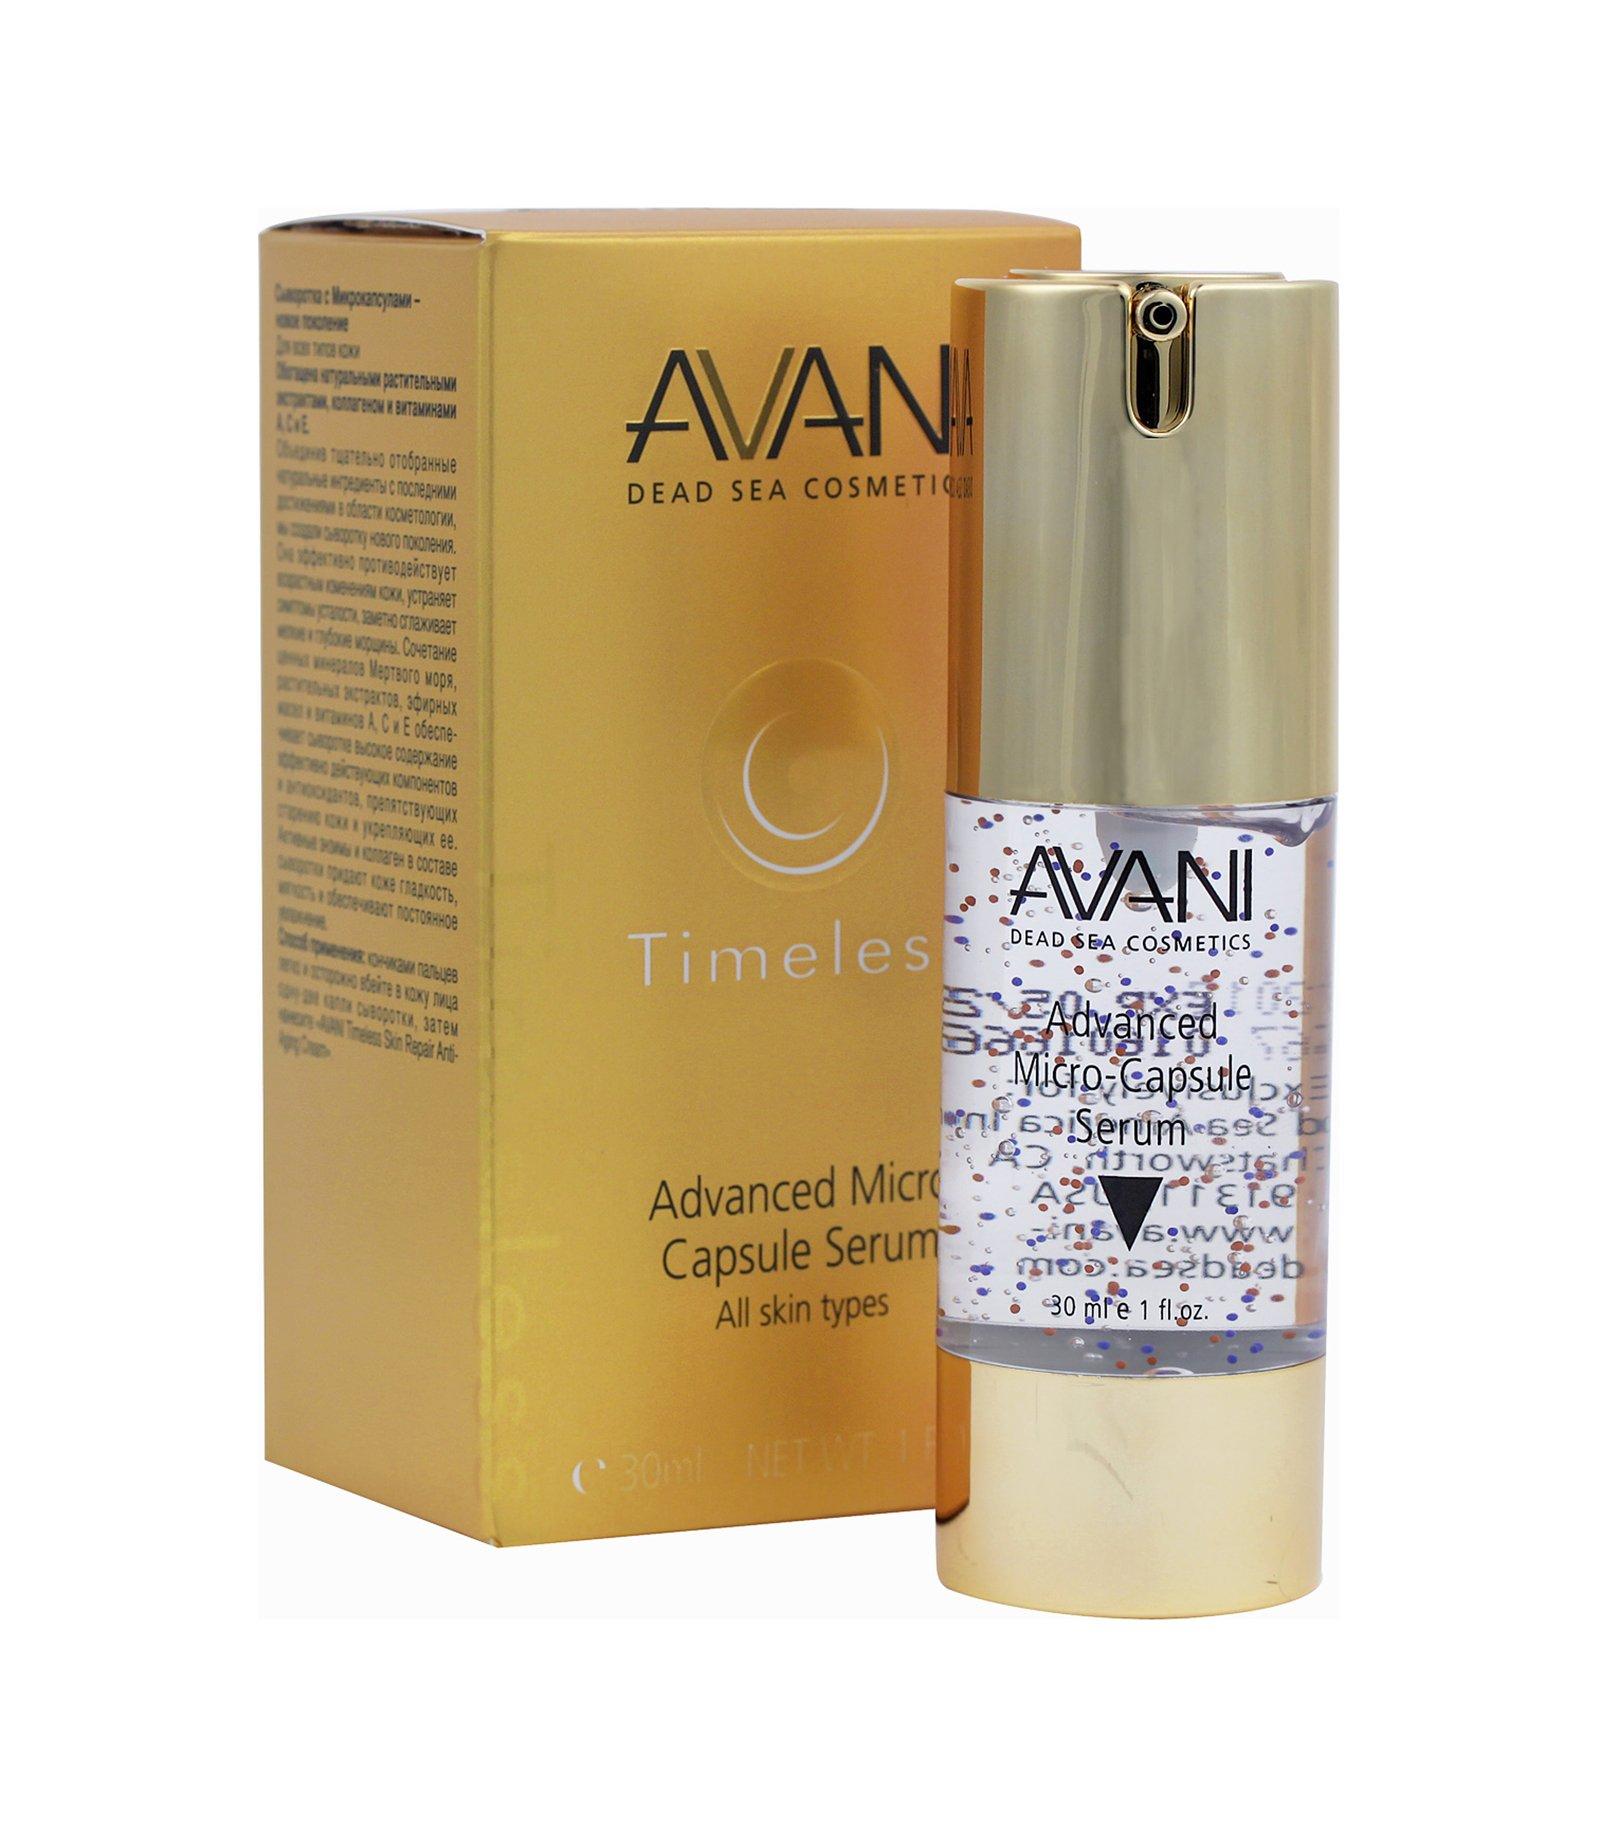 AVANI Advanced Micro Capsule Serum, 1 fl. oz.